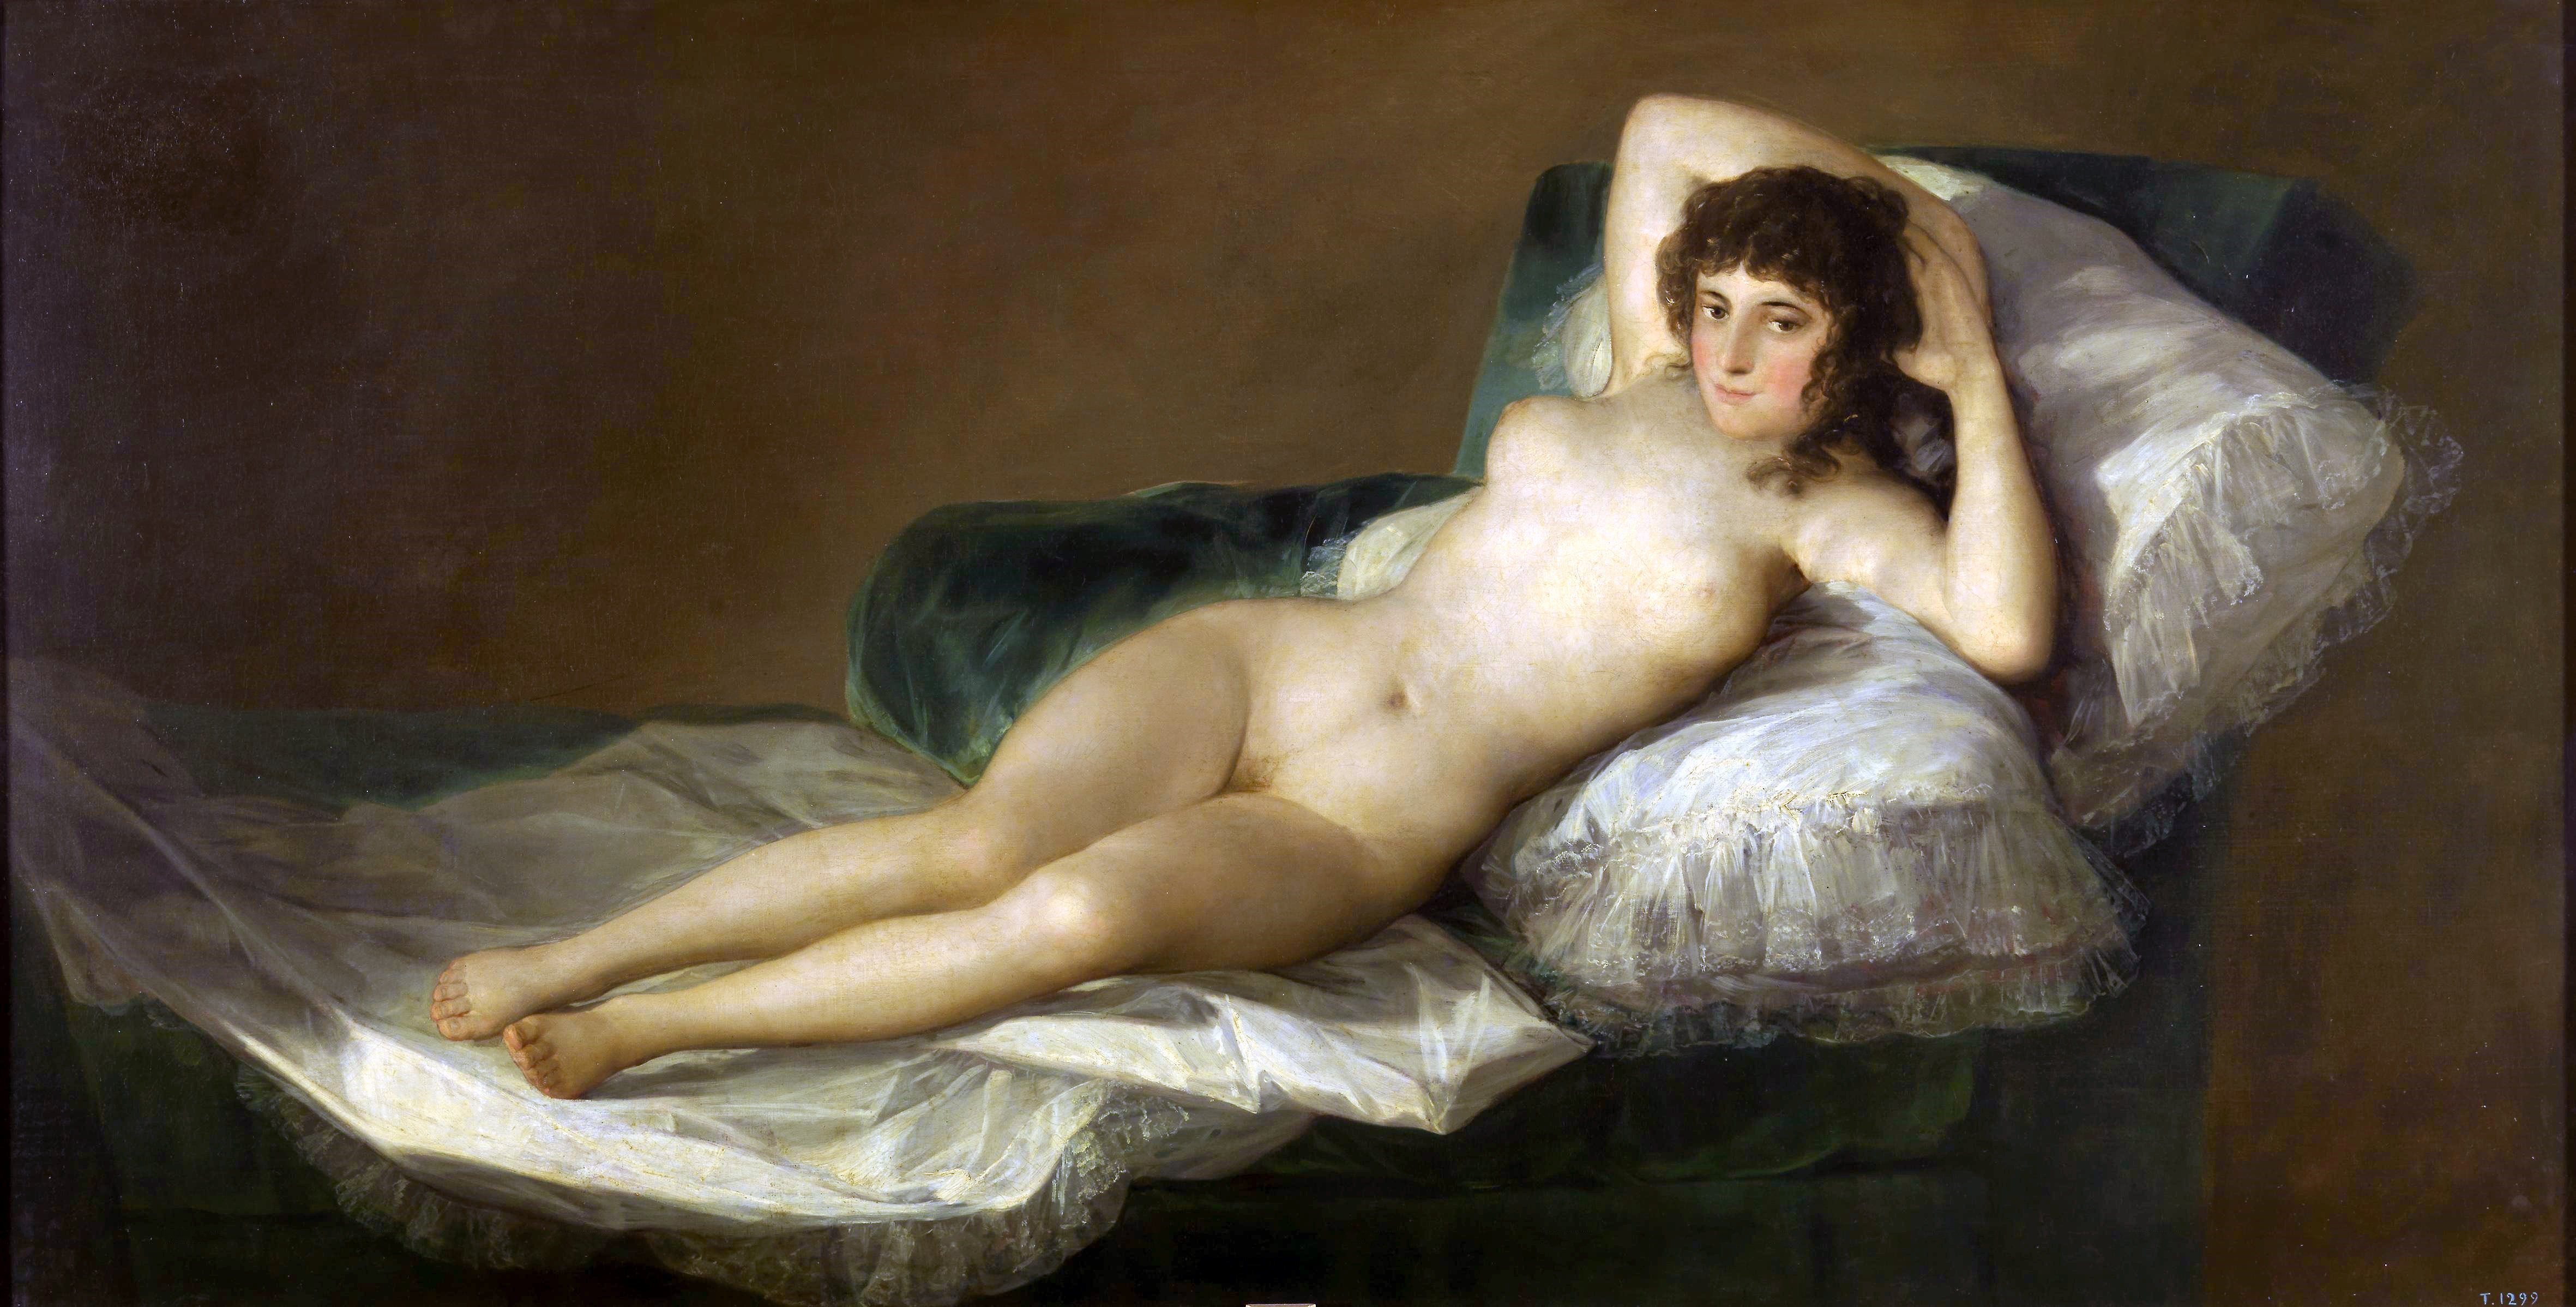 Francisco de Goya y Lucientes, 1746-1828. Маха обнажённая (до 1800. 98 х 191 см. Мадрид, Прадо